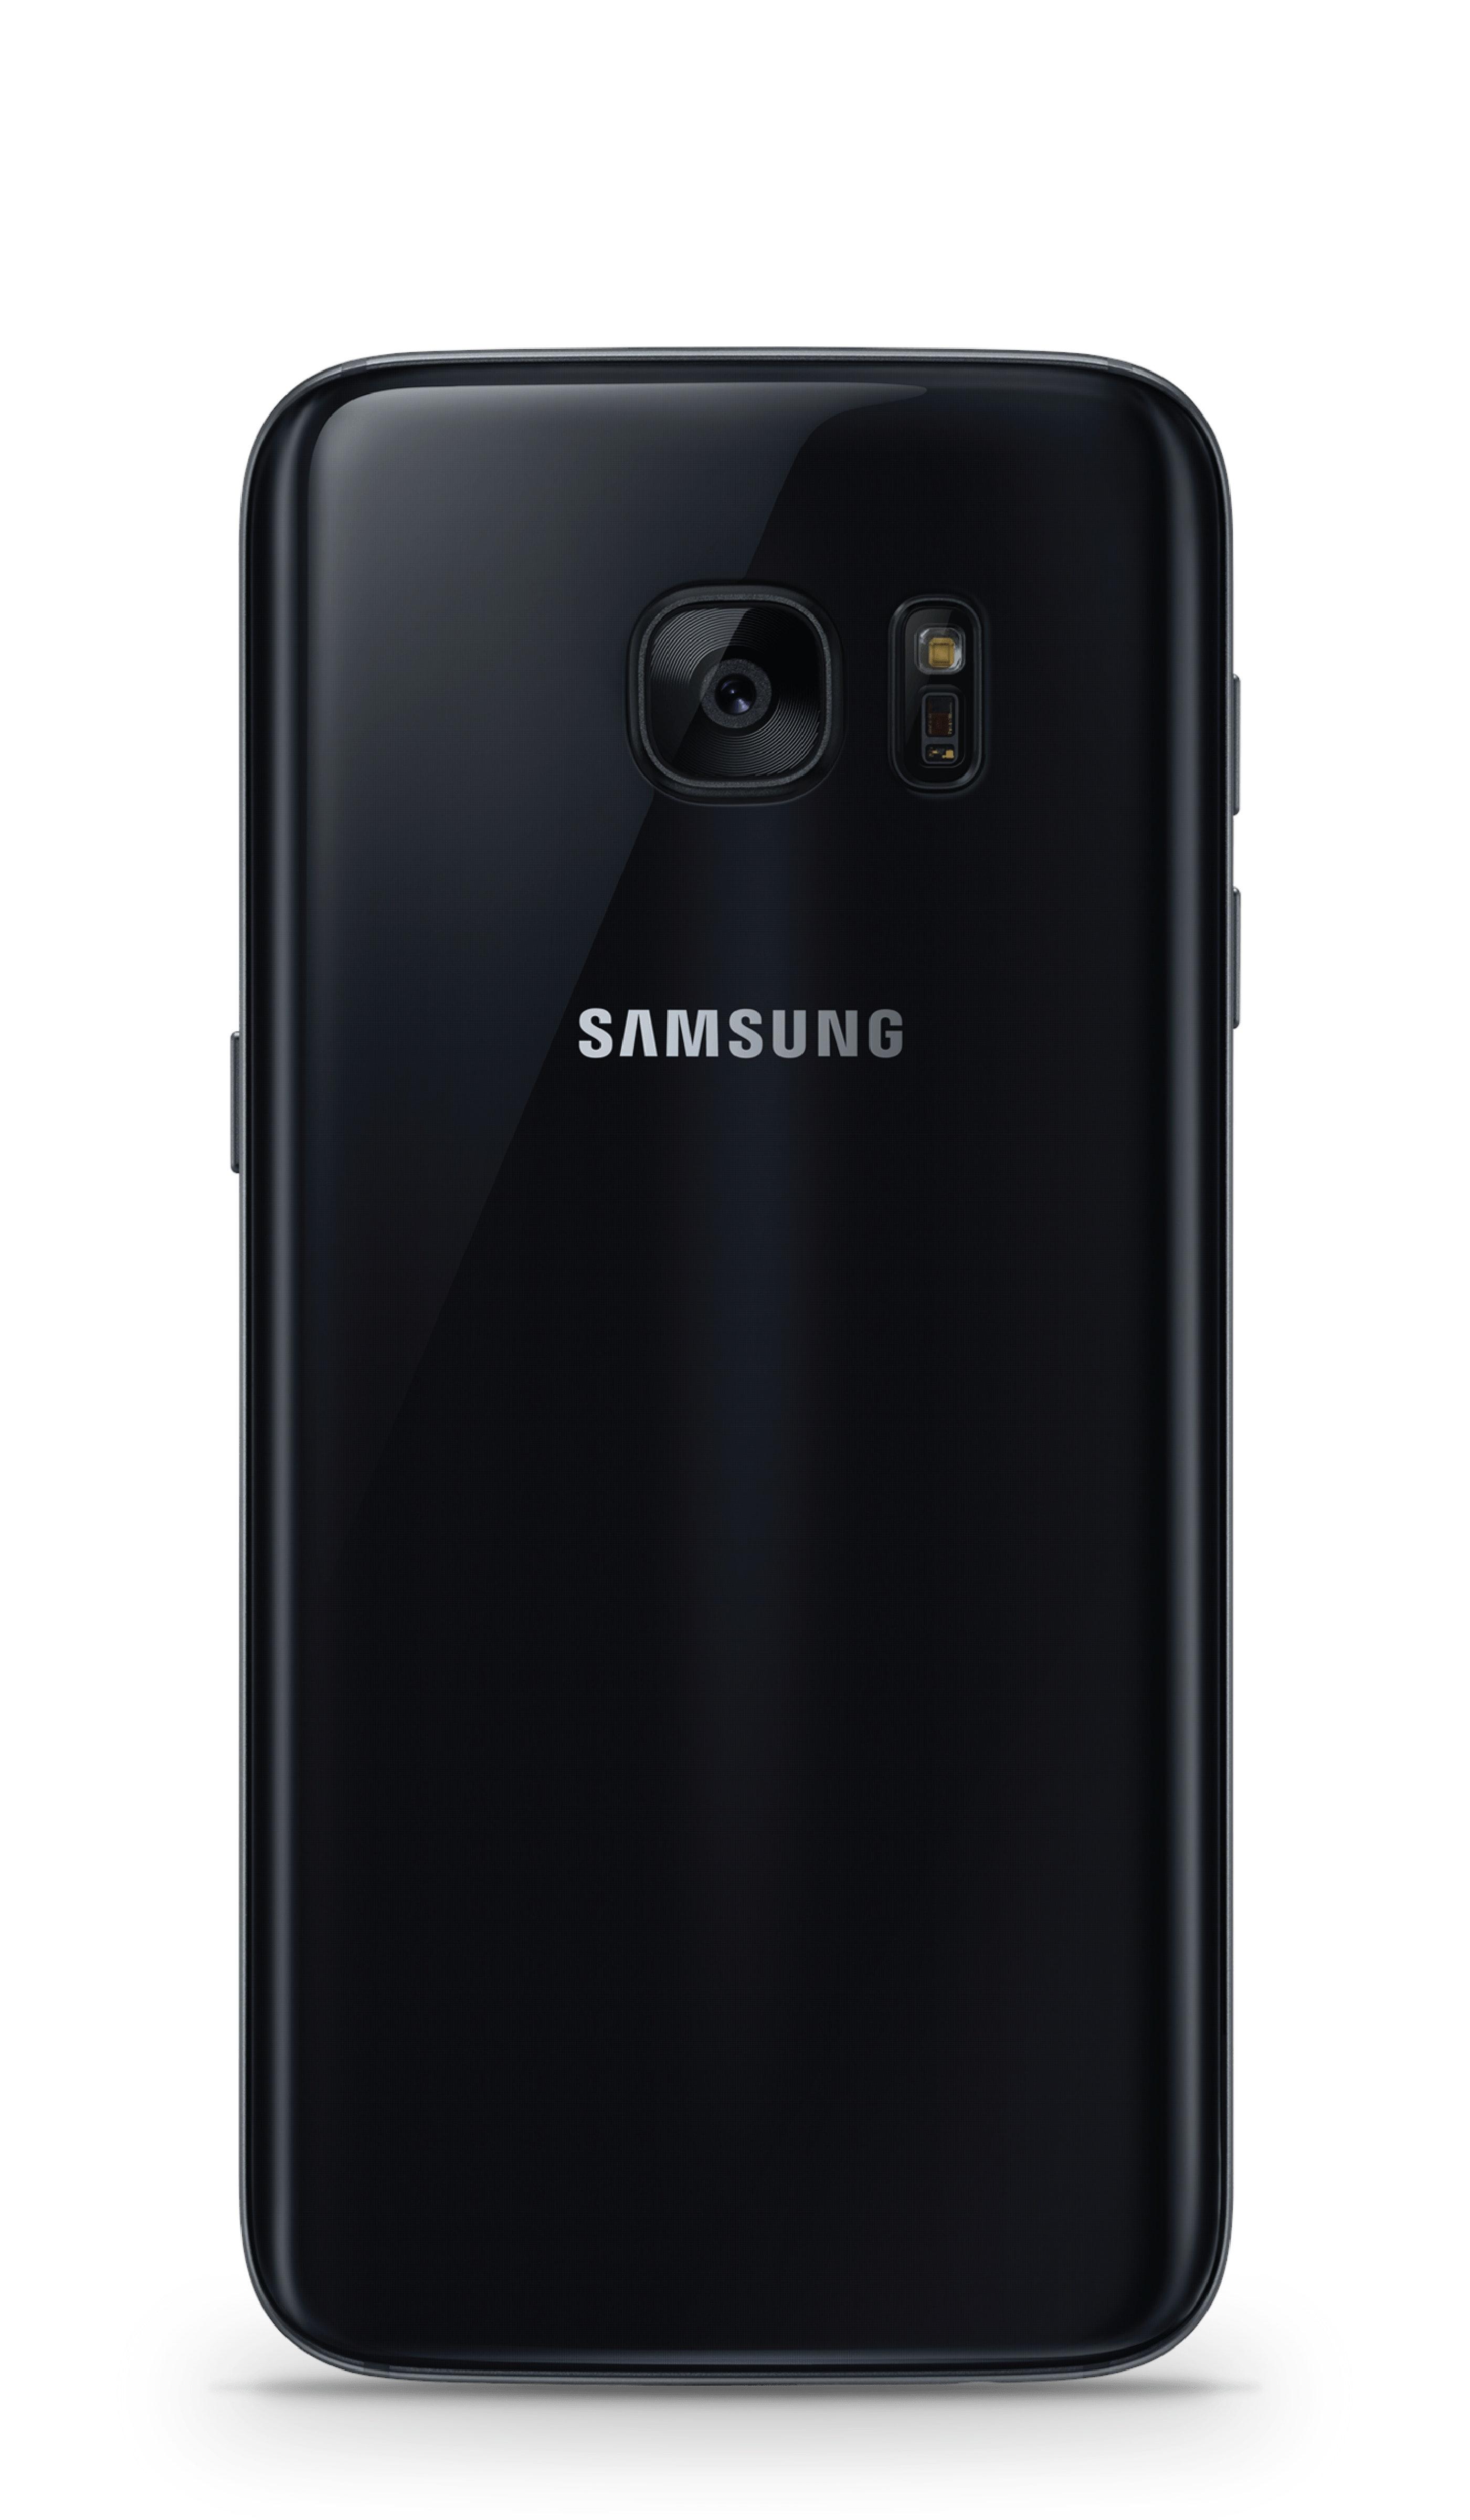 Samsung Galaxy S7 image